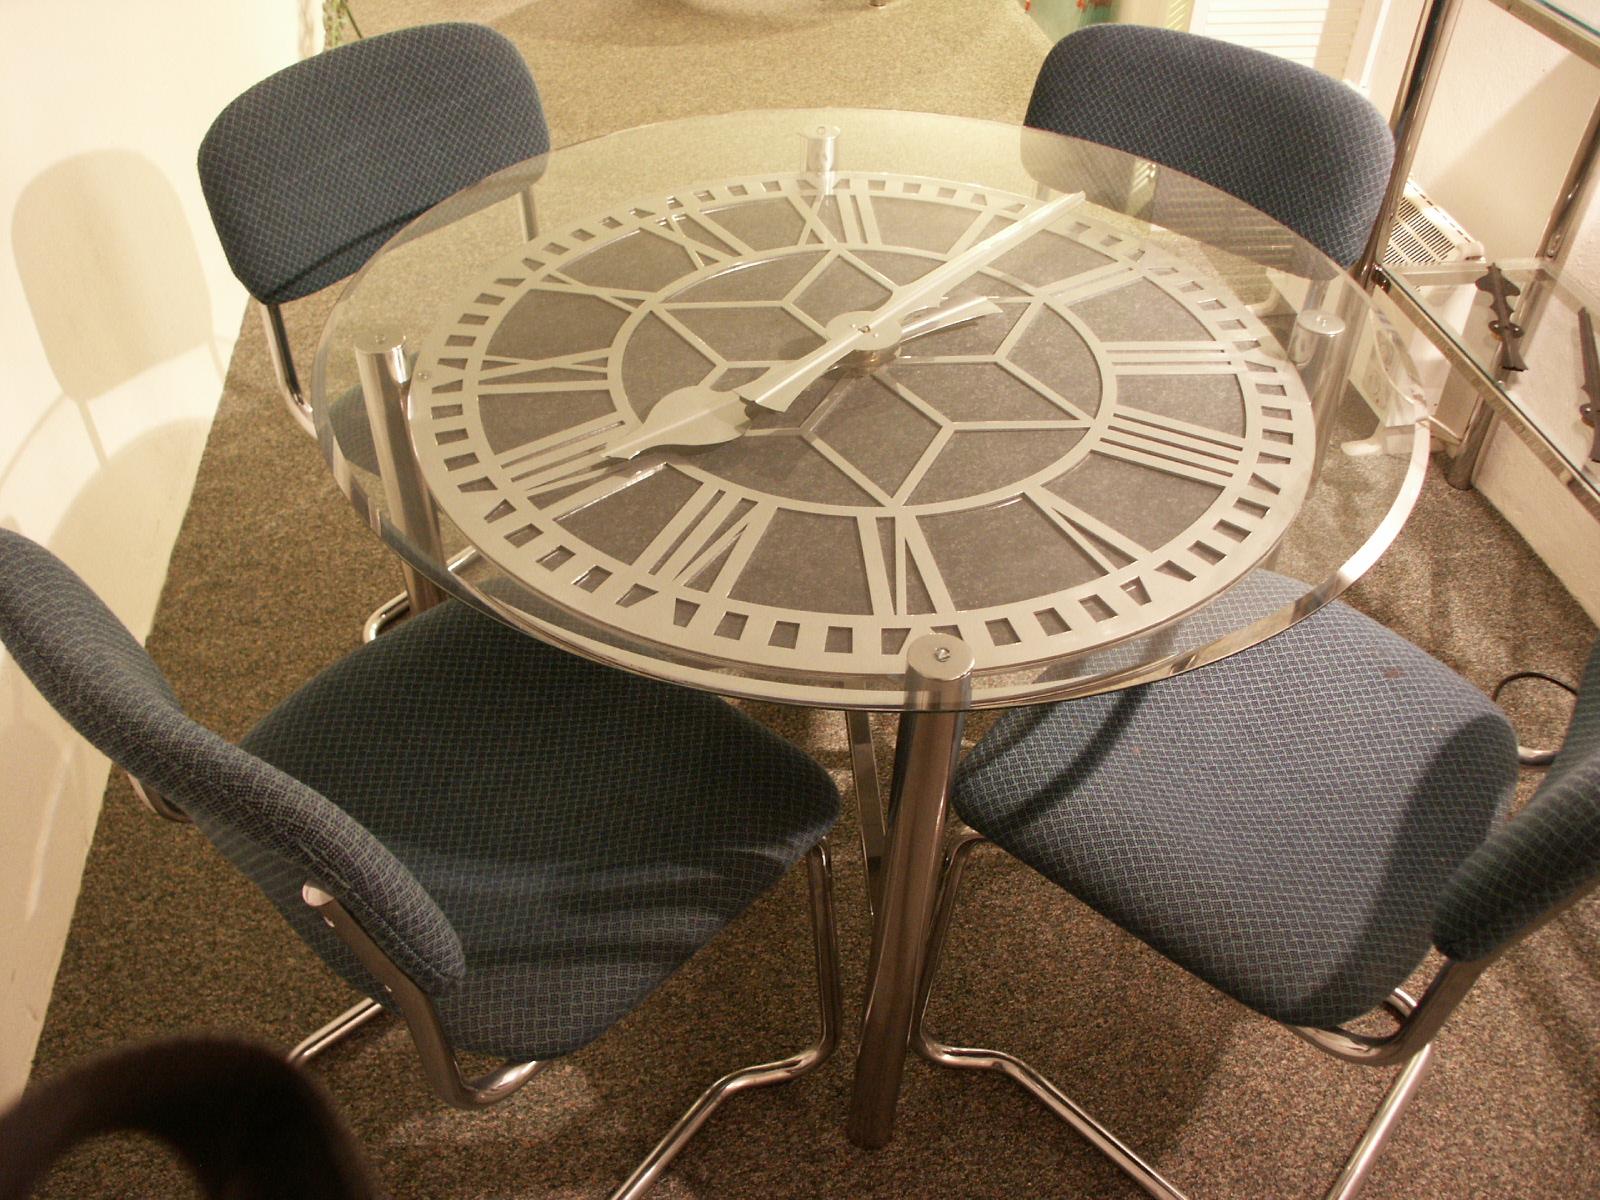 Round clock table